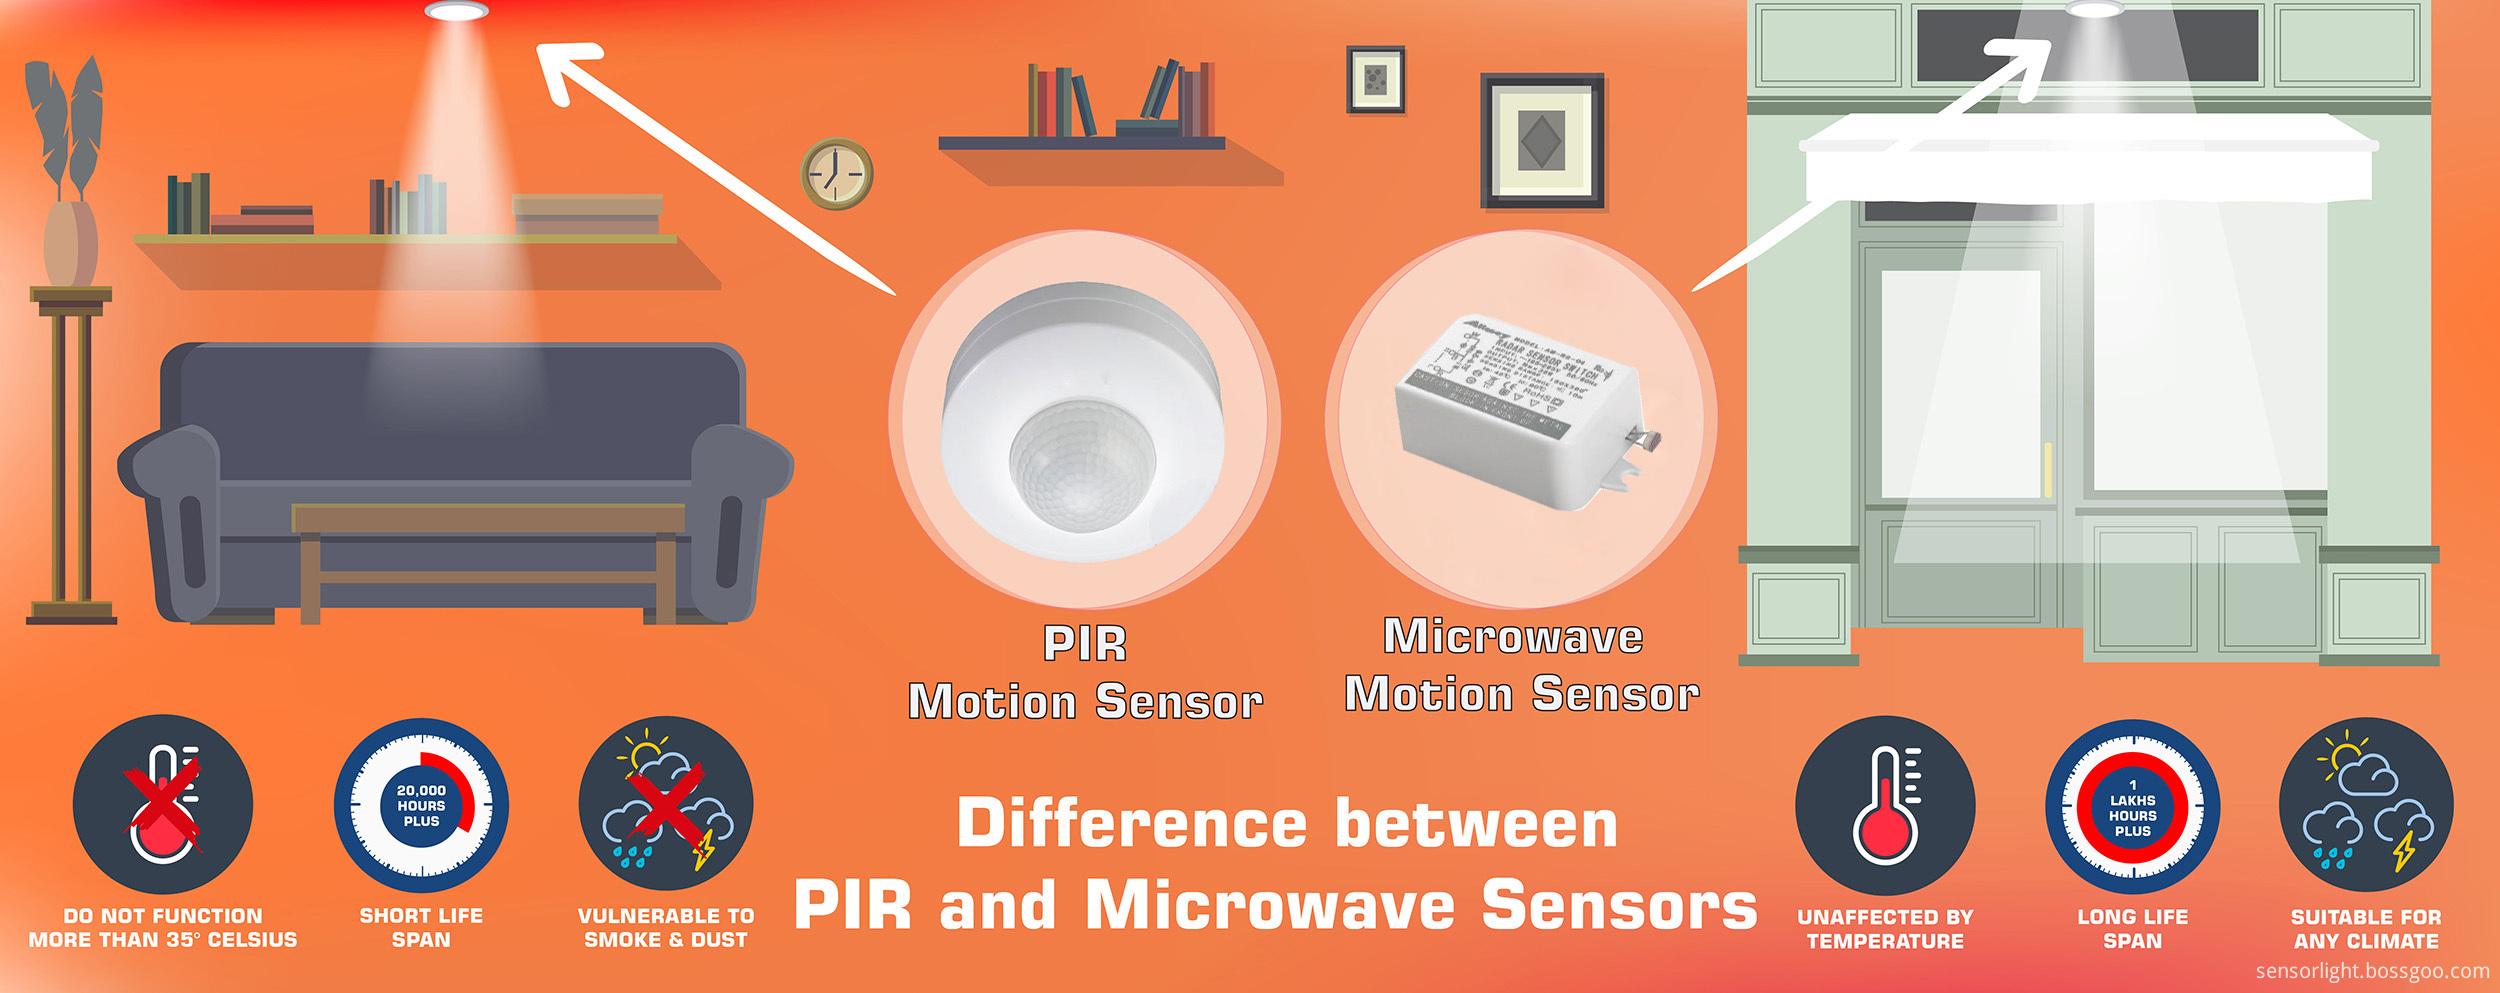 Microwave sensor vs pir